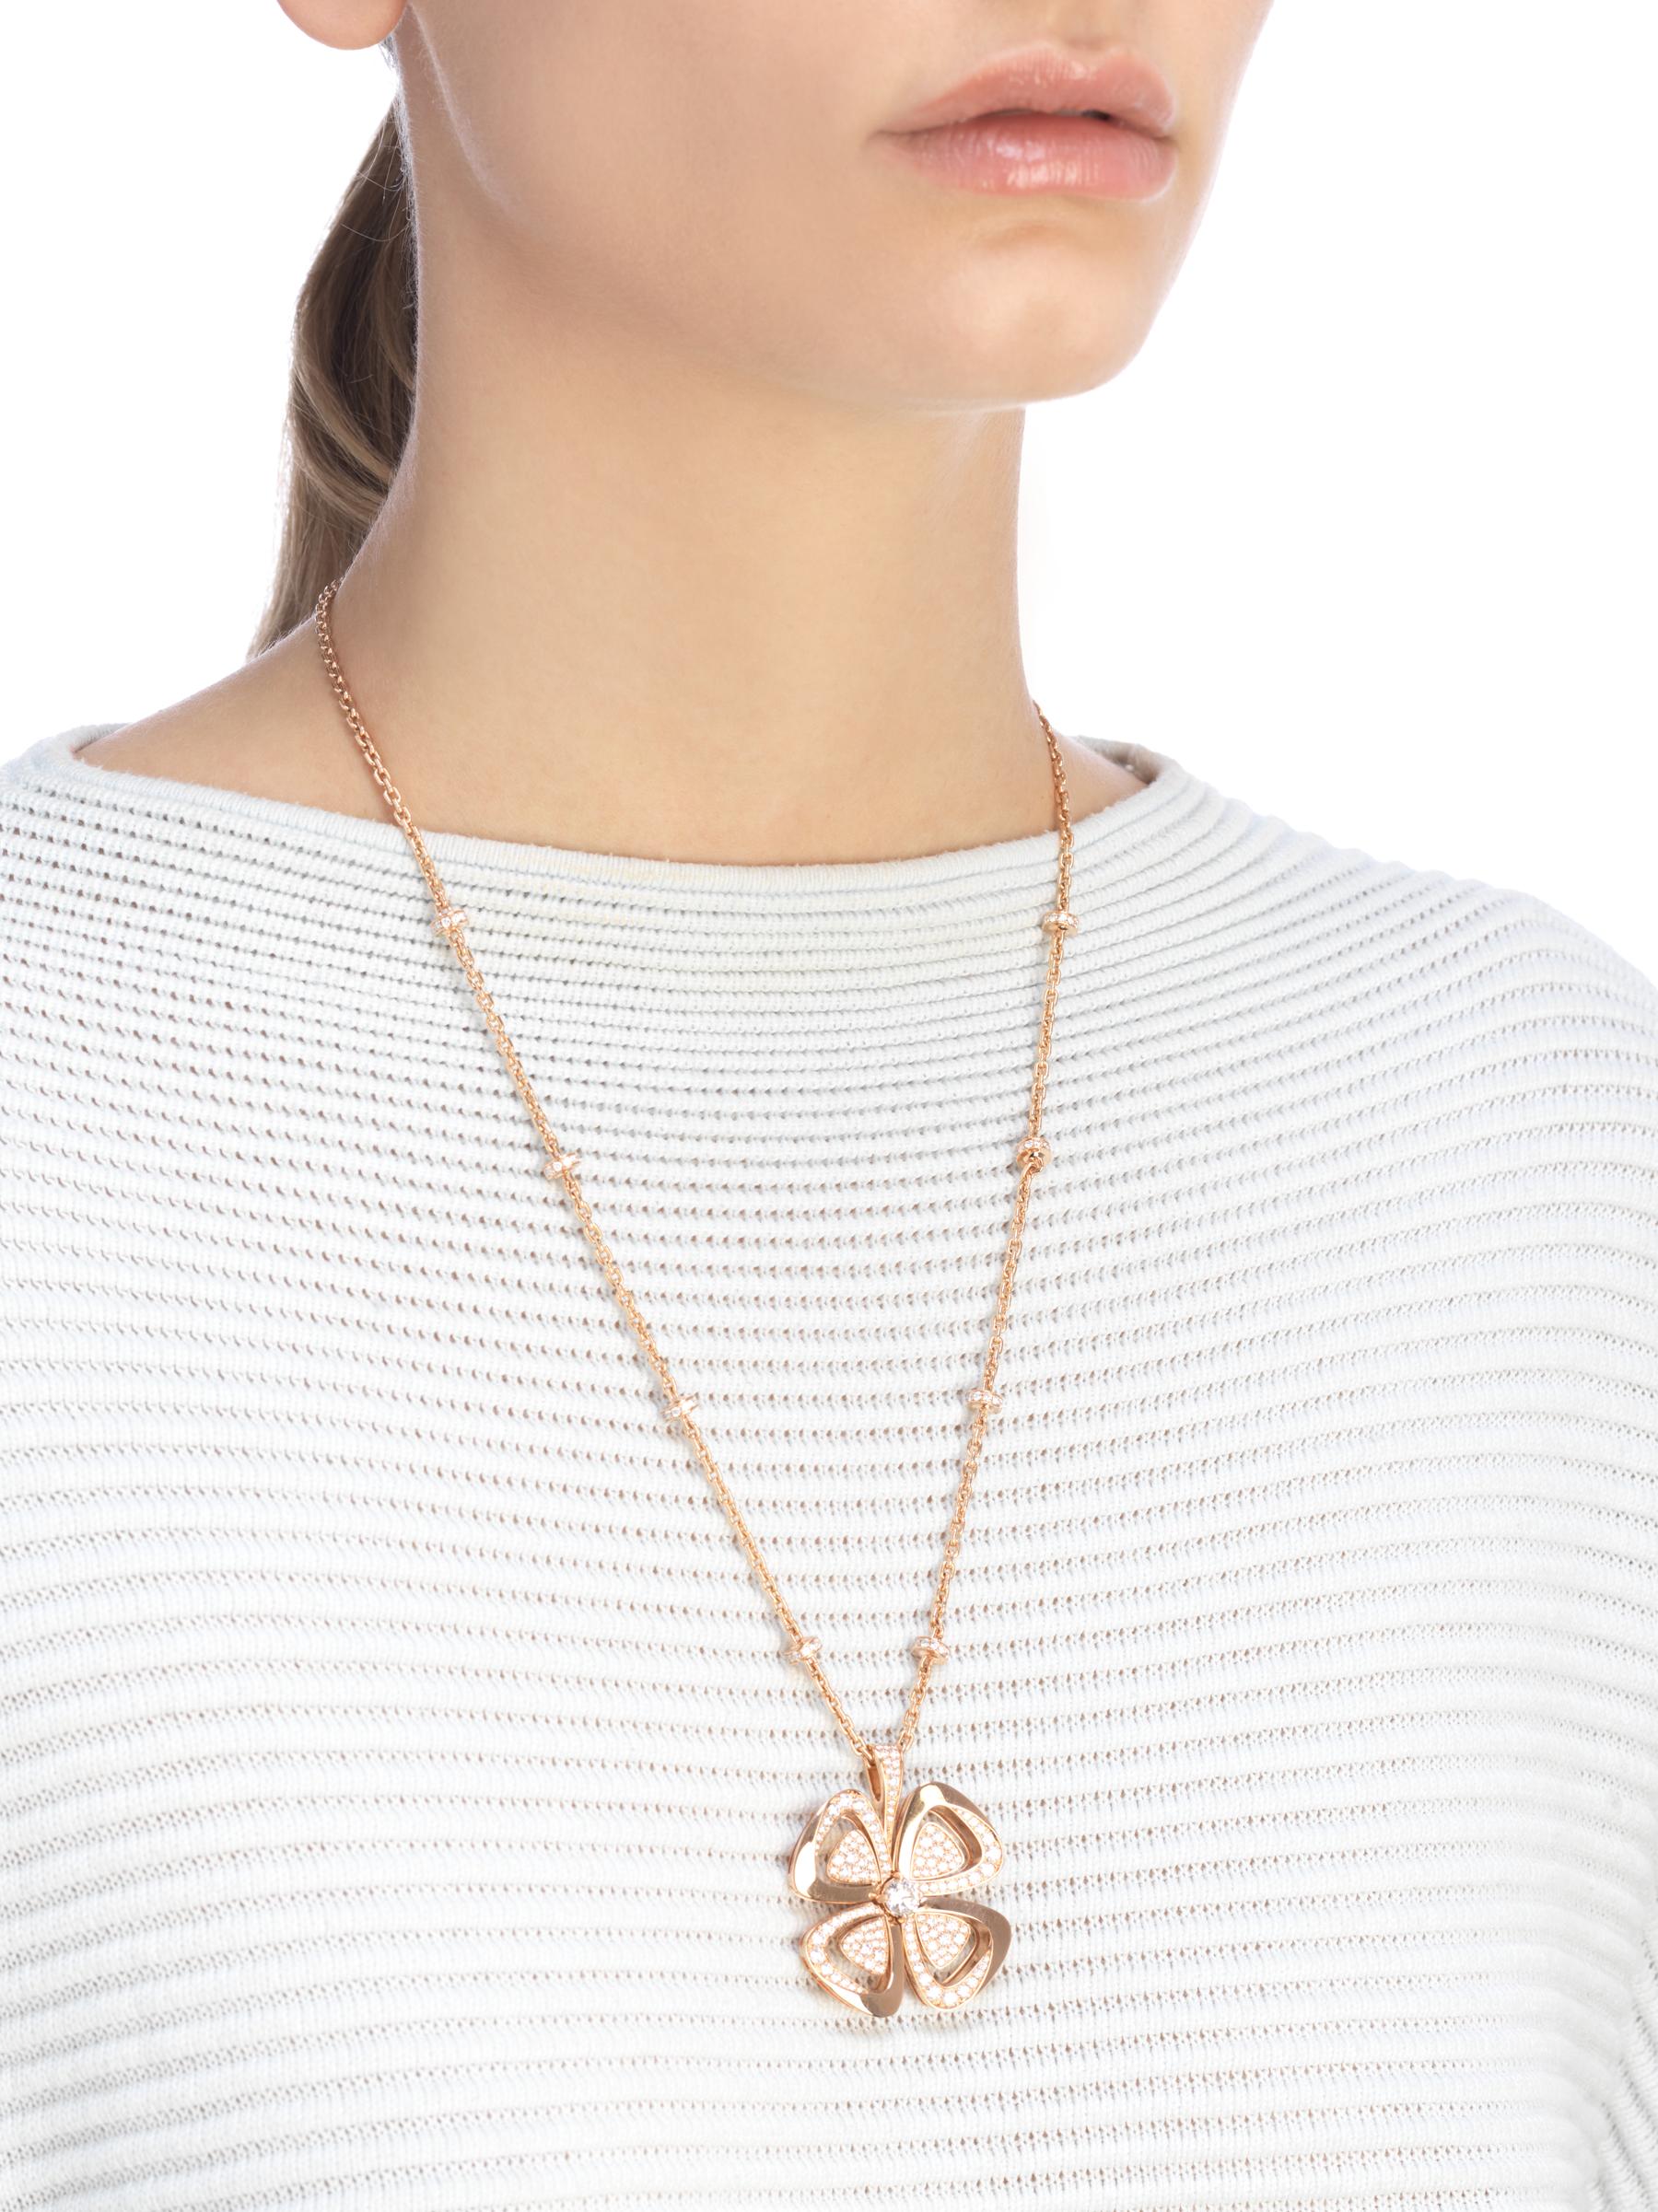 Collar Fiorever en oro rosa de 18qt con un diamante central redondo talla brillante y pavé de diamantes. 357218 image 4